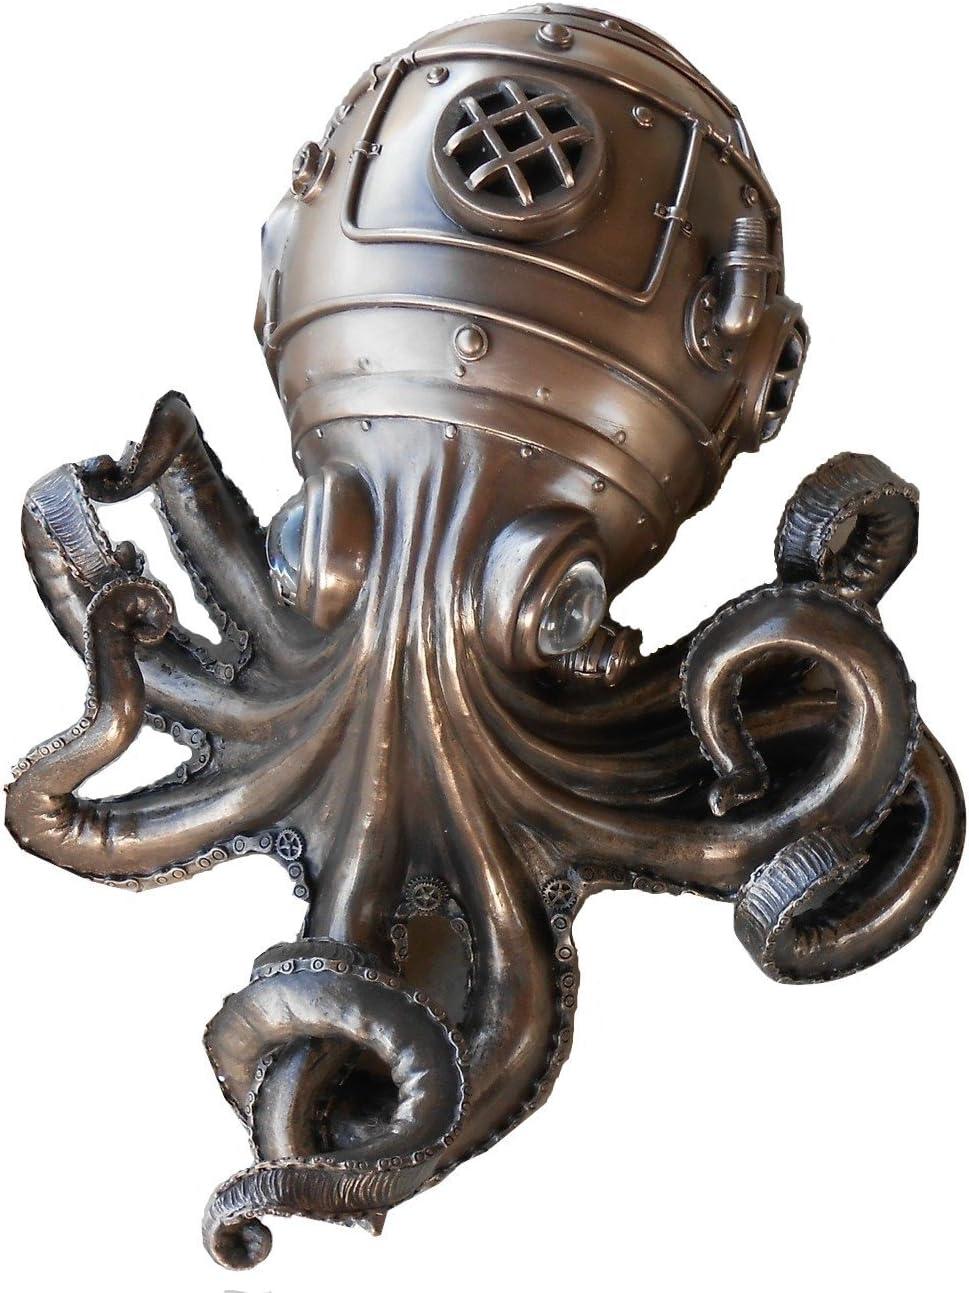 Steampunk Octopus Kraken with Glass Eyes Secret Stash Trinket Box 10.75 L